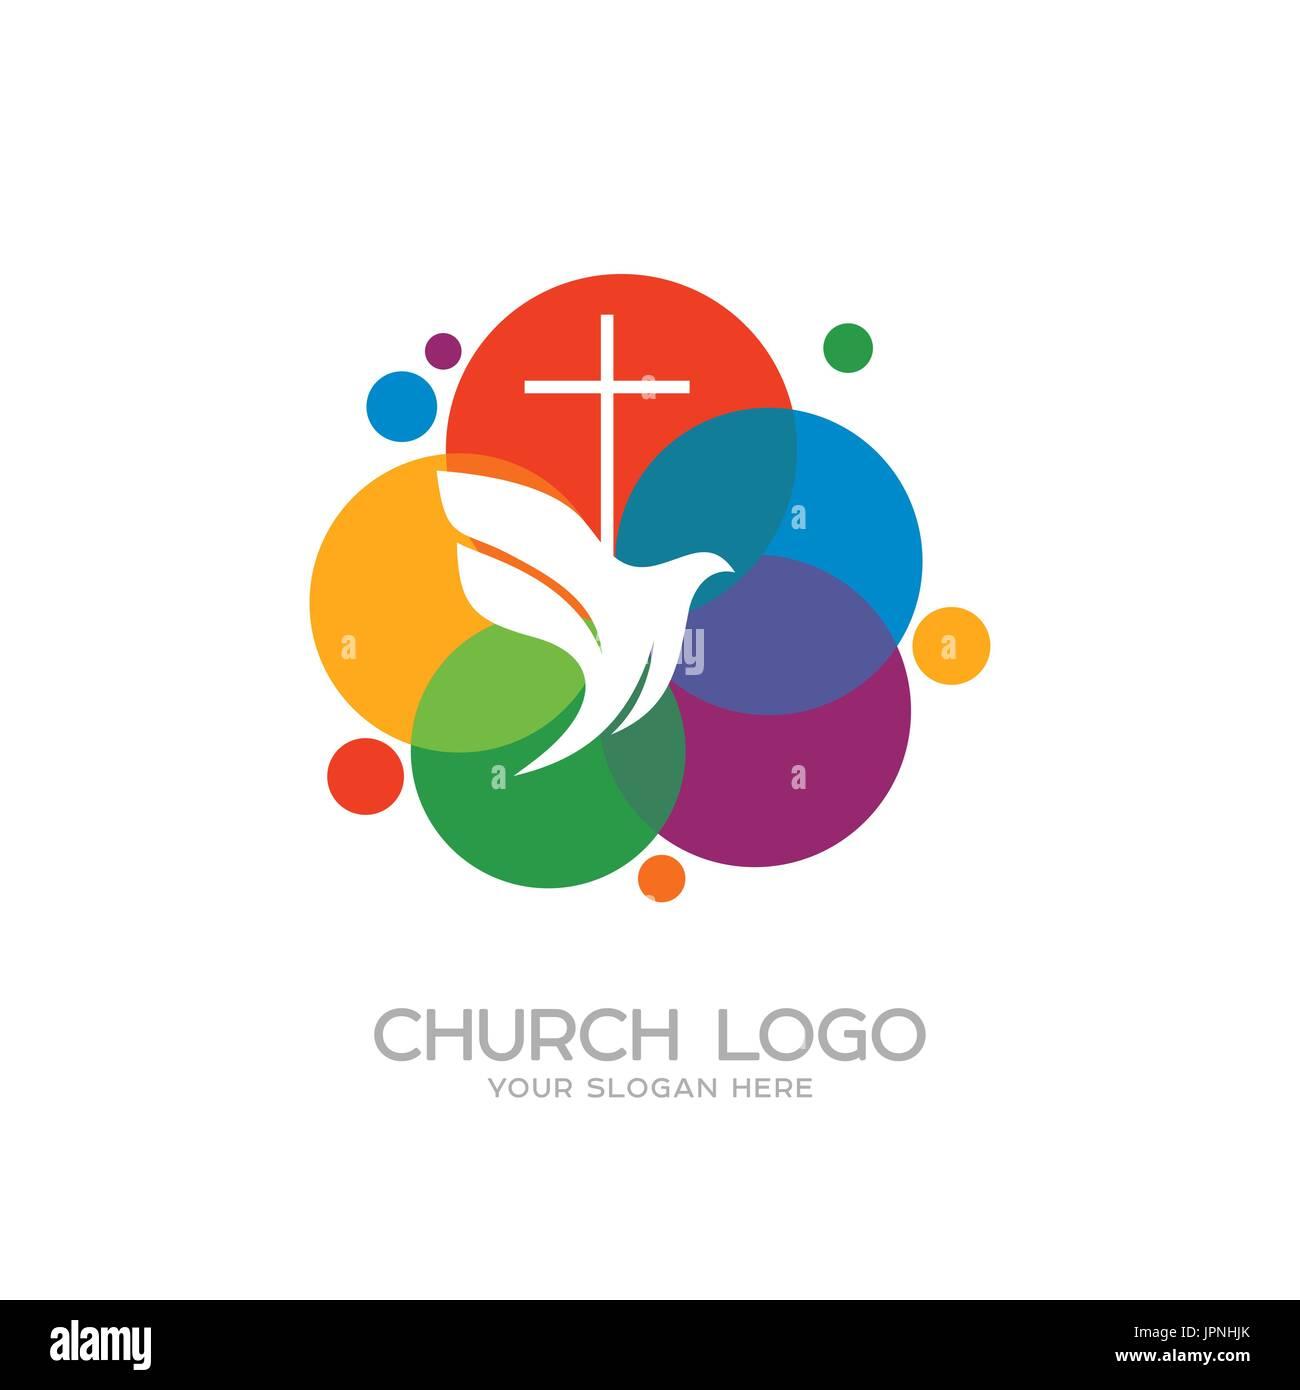 Church logo christian symbols the cross of jesus and the dove church logo christian symbols the cross of jesus and the dove thecheapjerseys Gallery